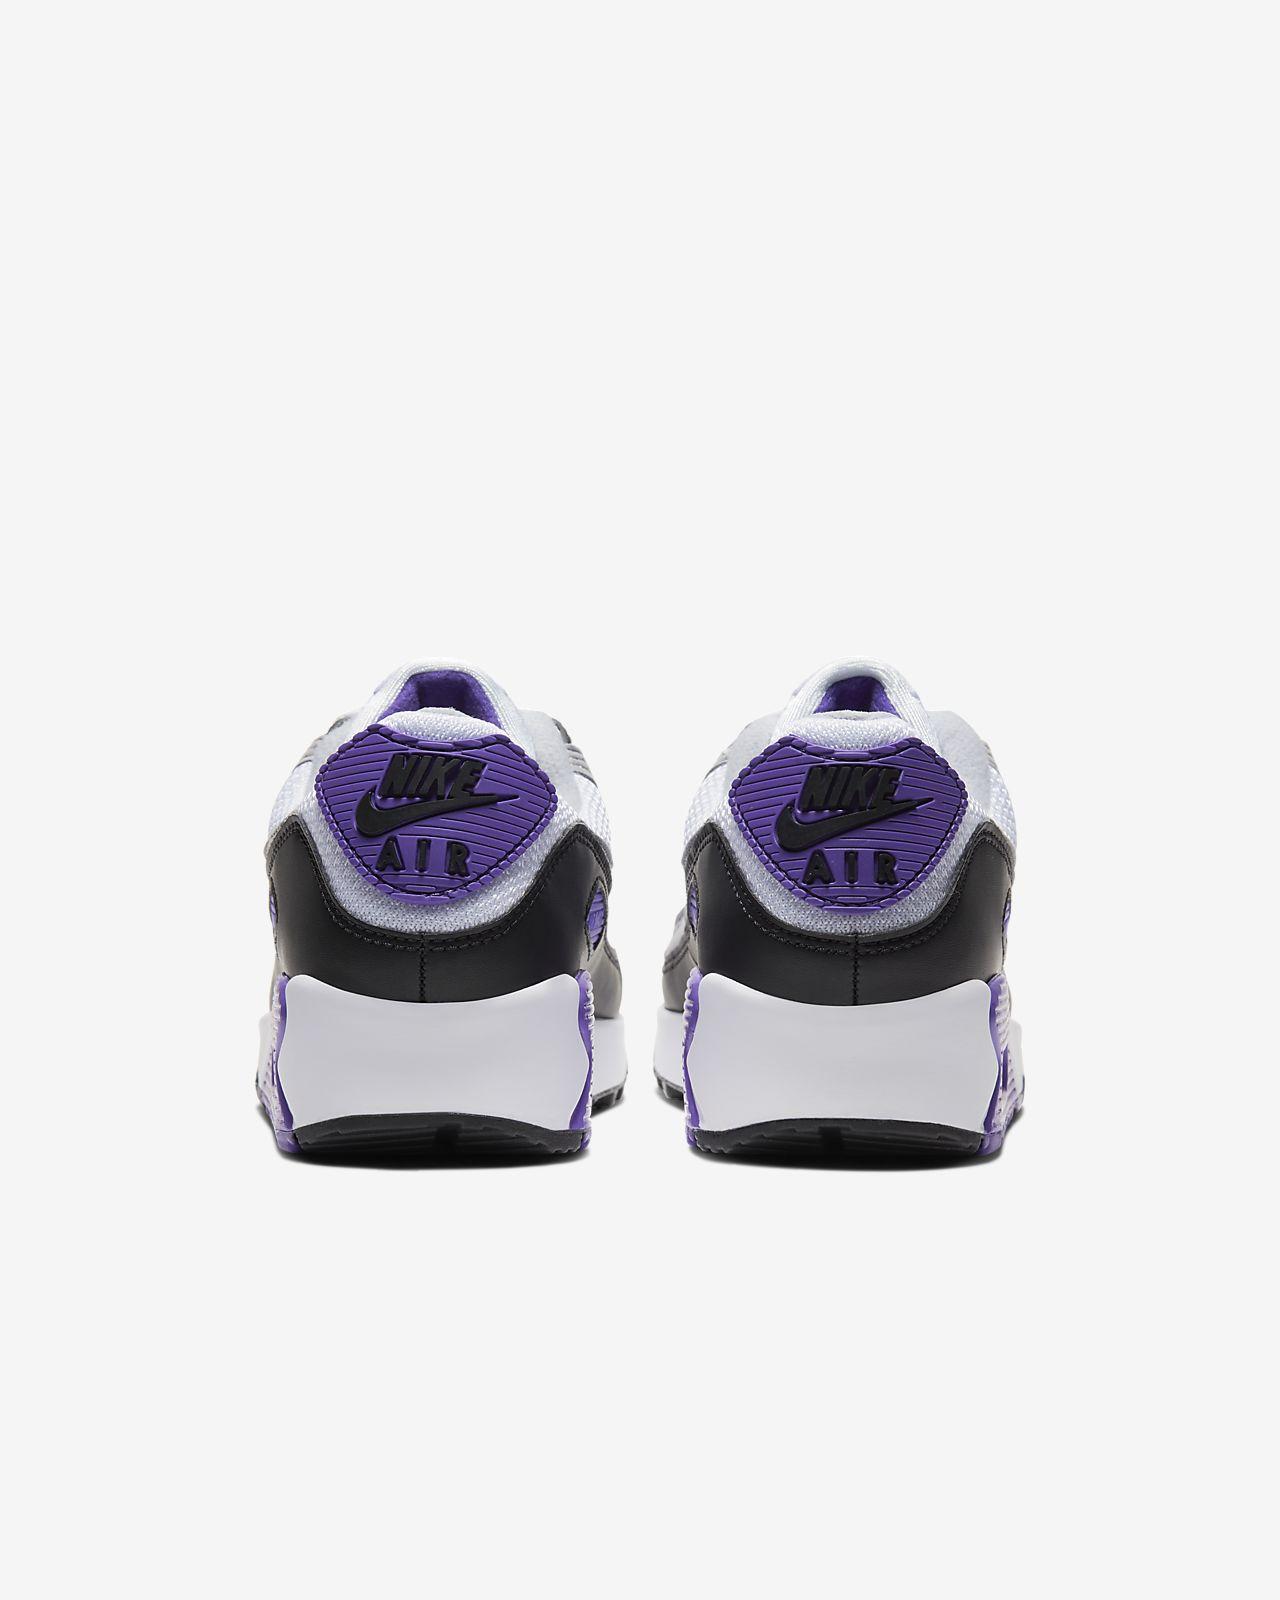 Nike Air Max 90 iD Damesschoen (met afbeeldingen) | Nike air